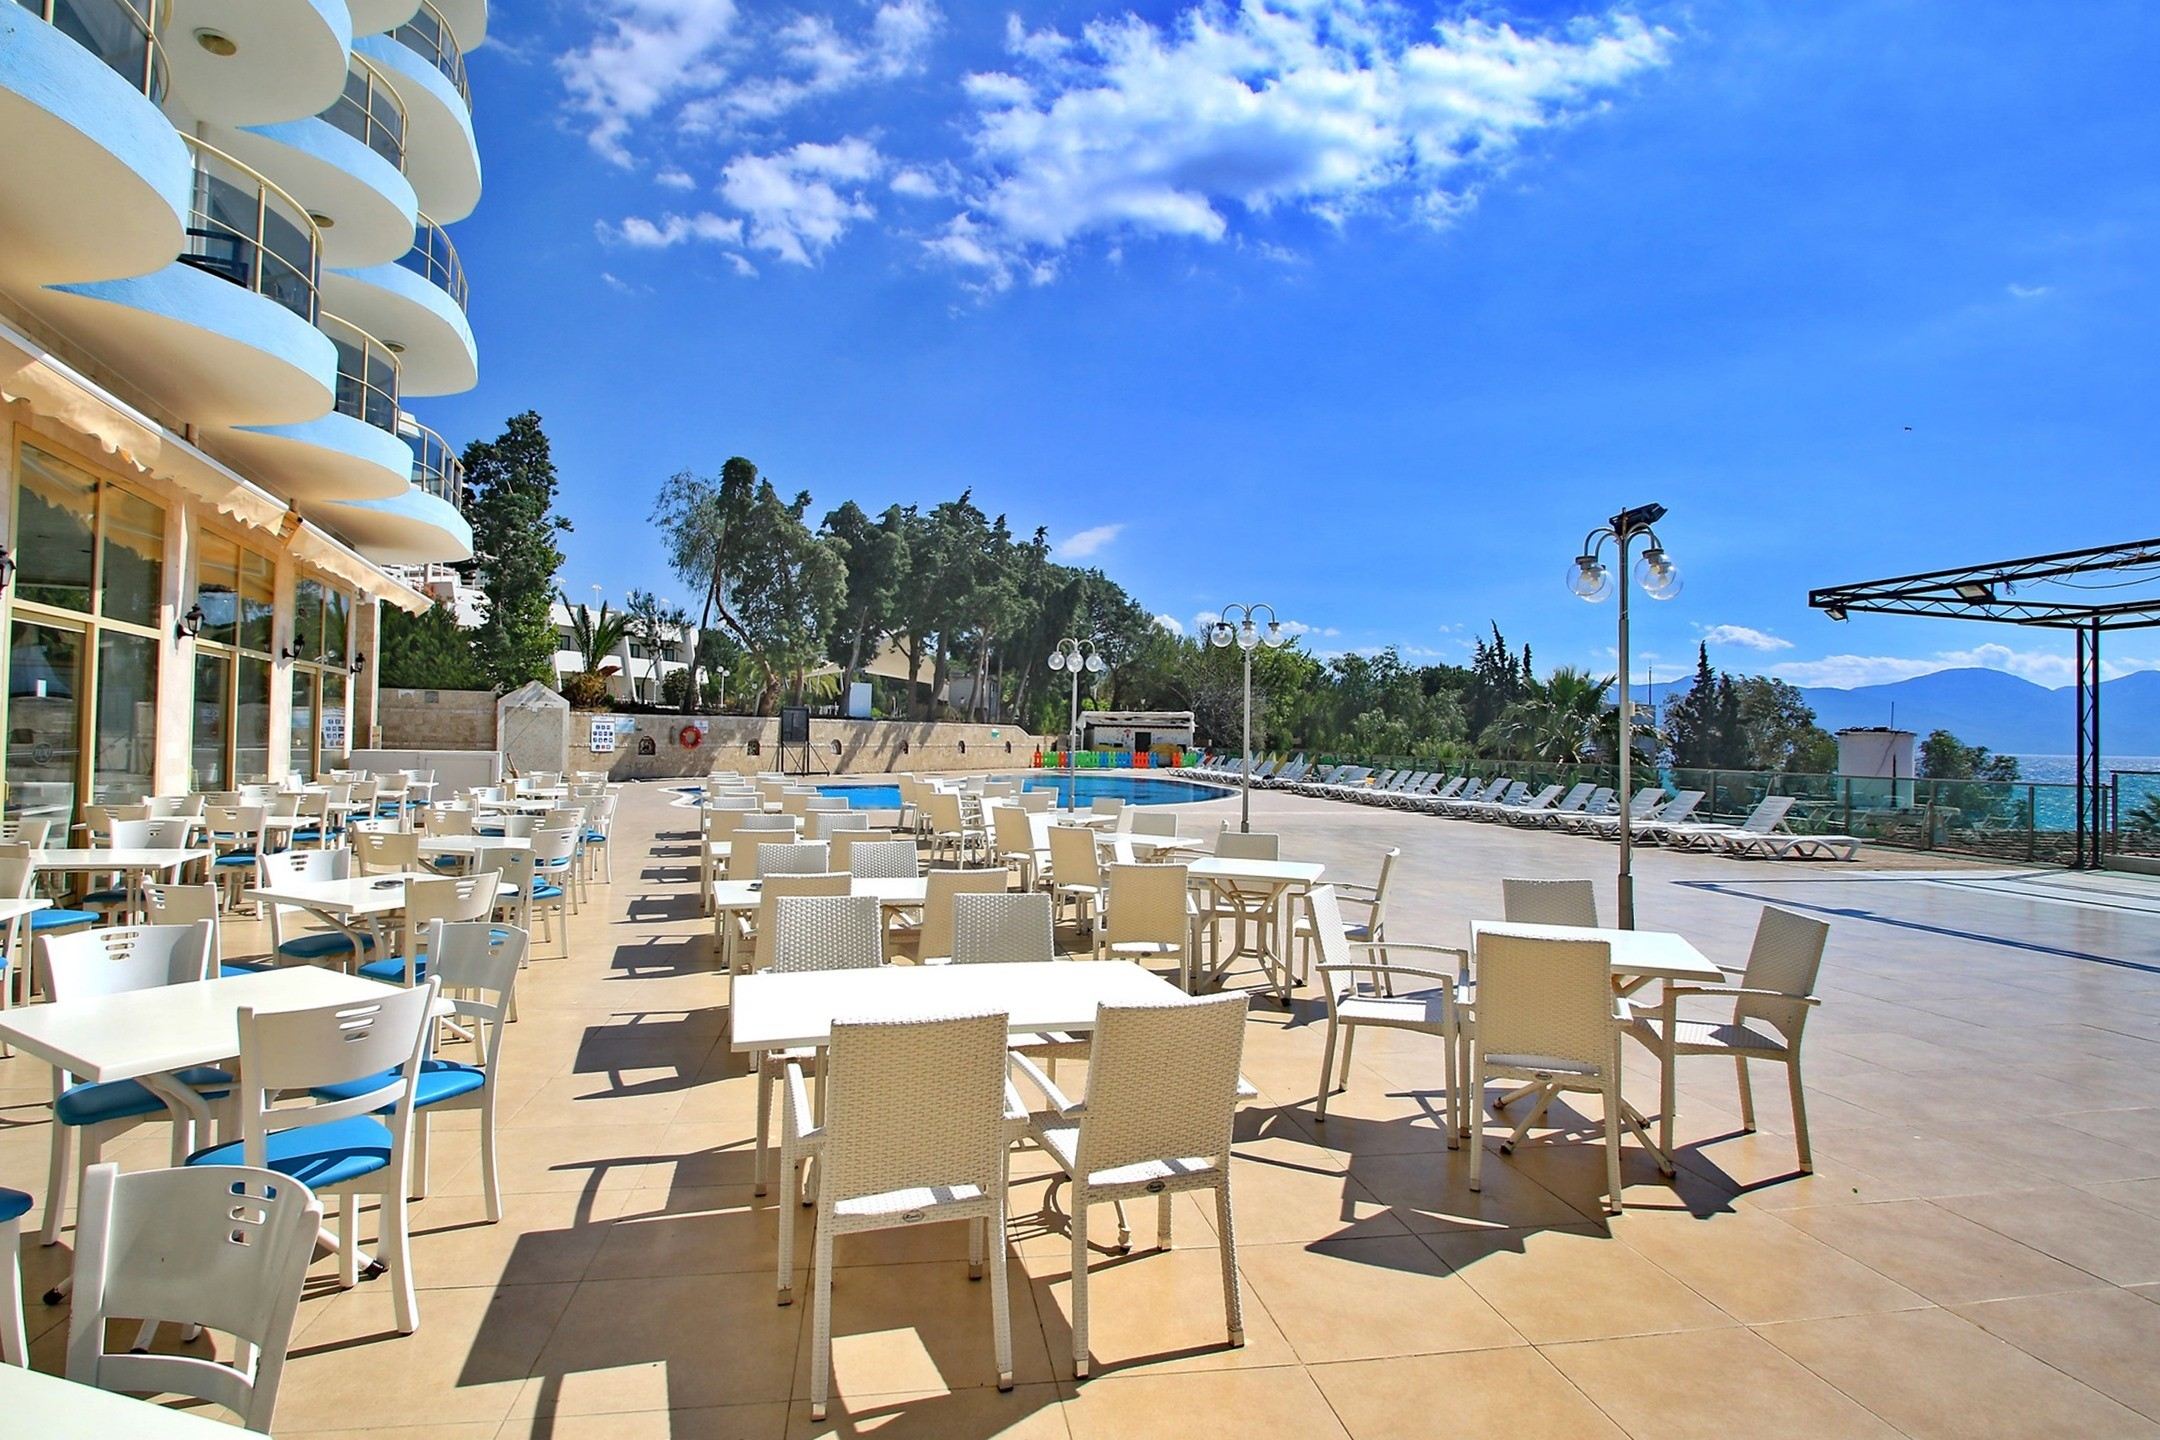 Hotel Arora 4* - ресторант, външна част